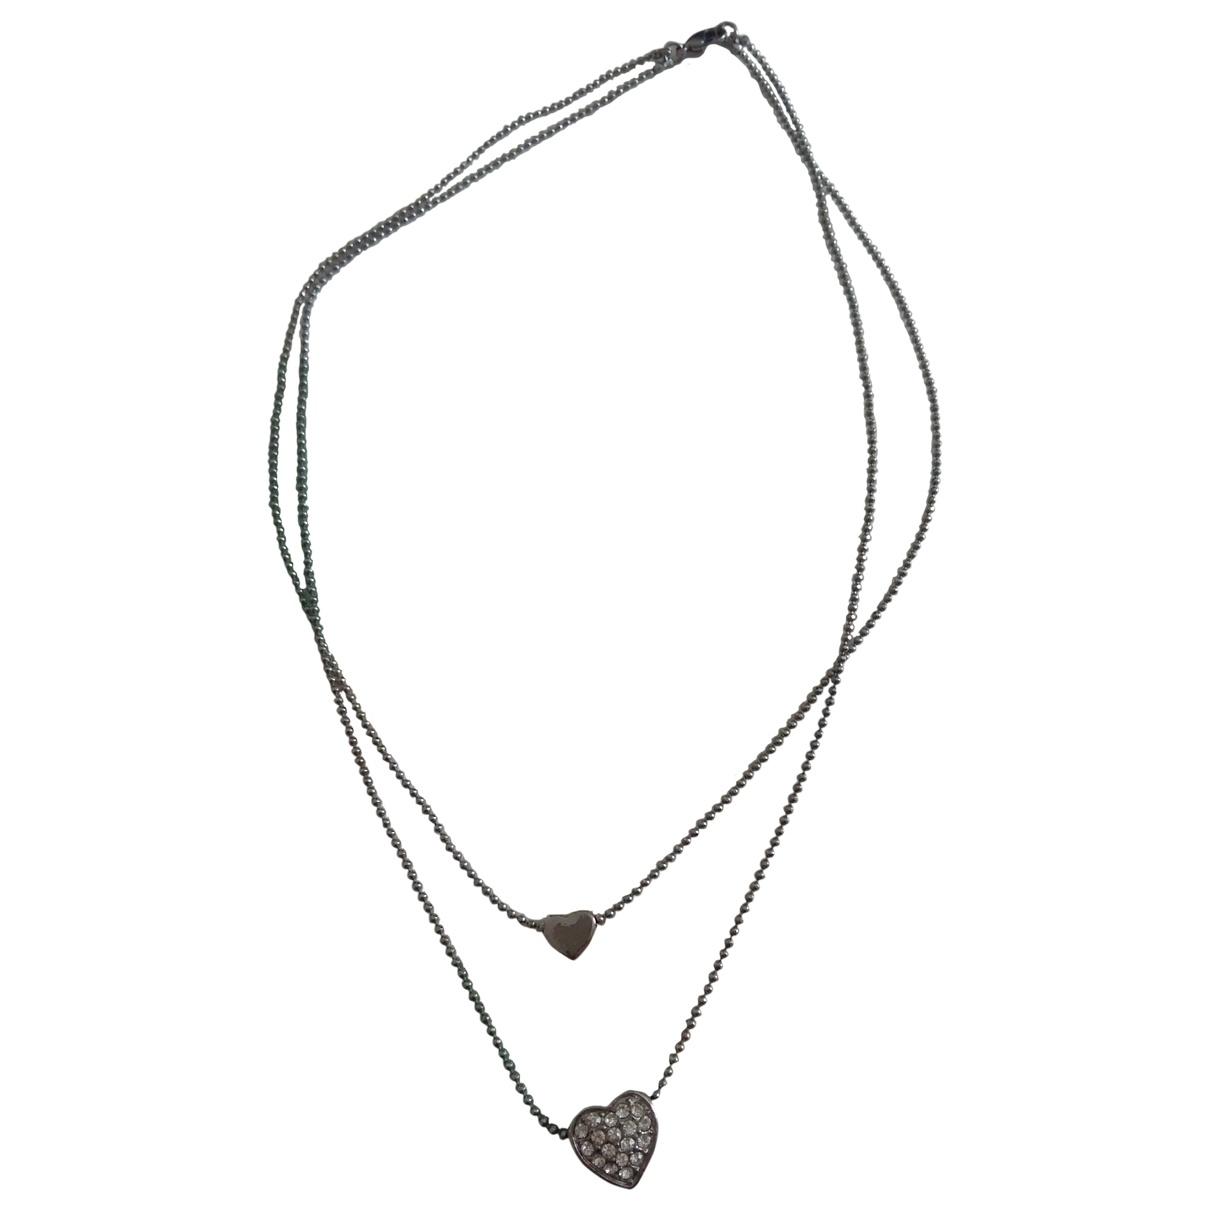 Collar Motifs Coeurs Non Signe / Unsigned